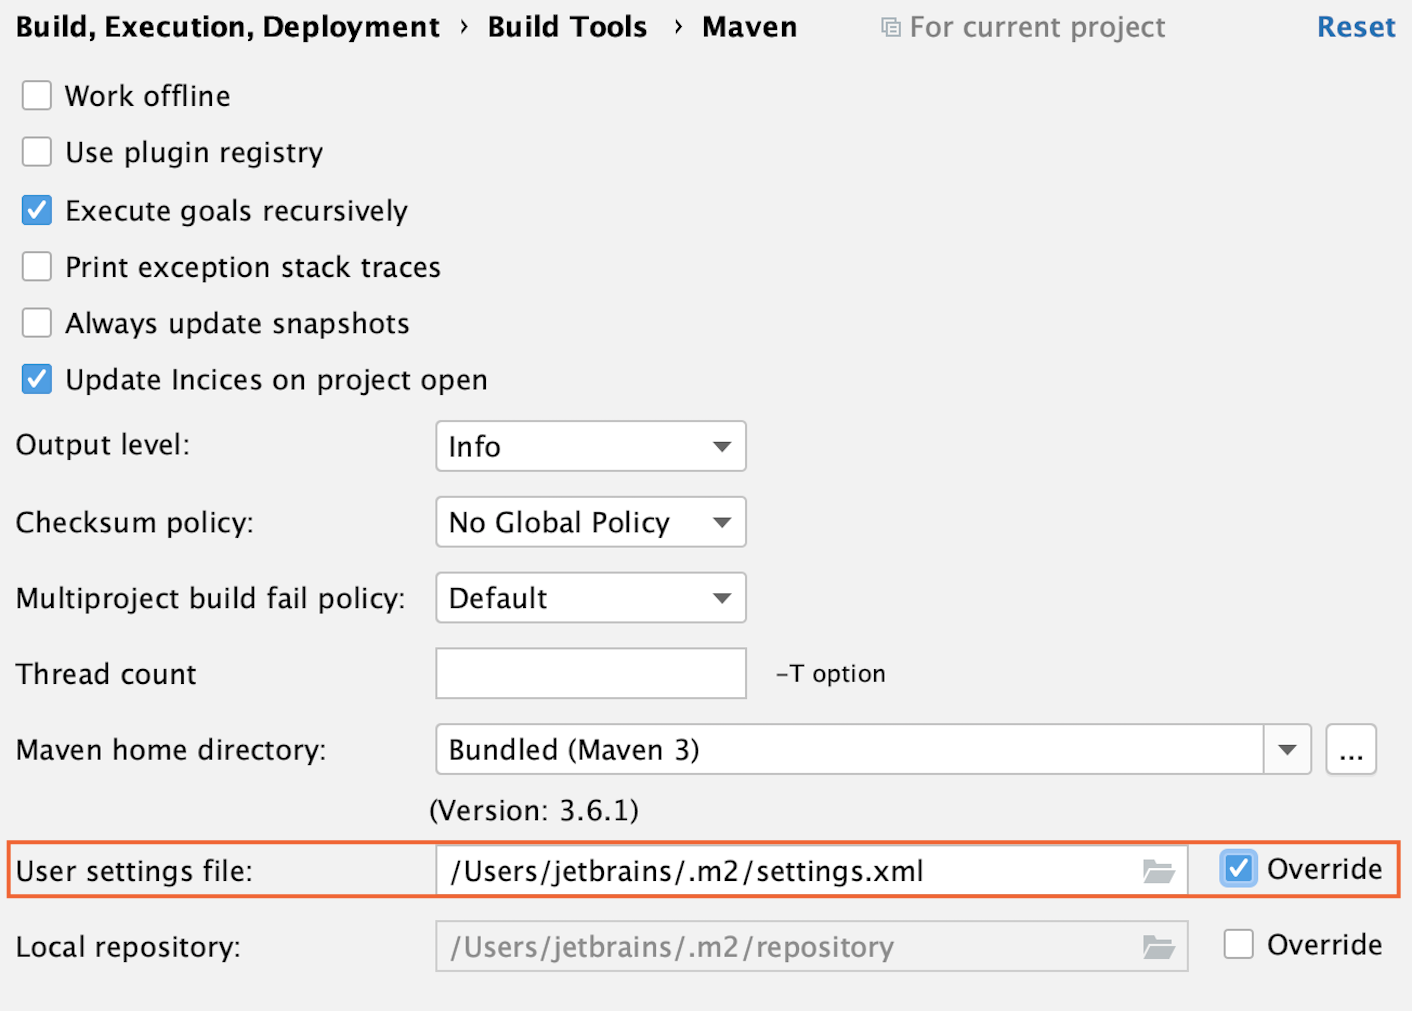 the Maven settings: User setting file